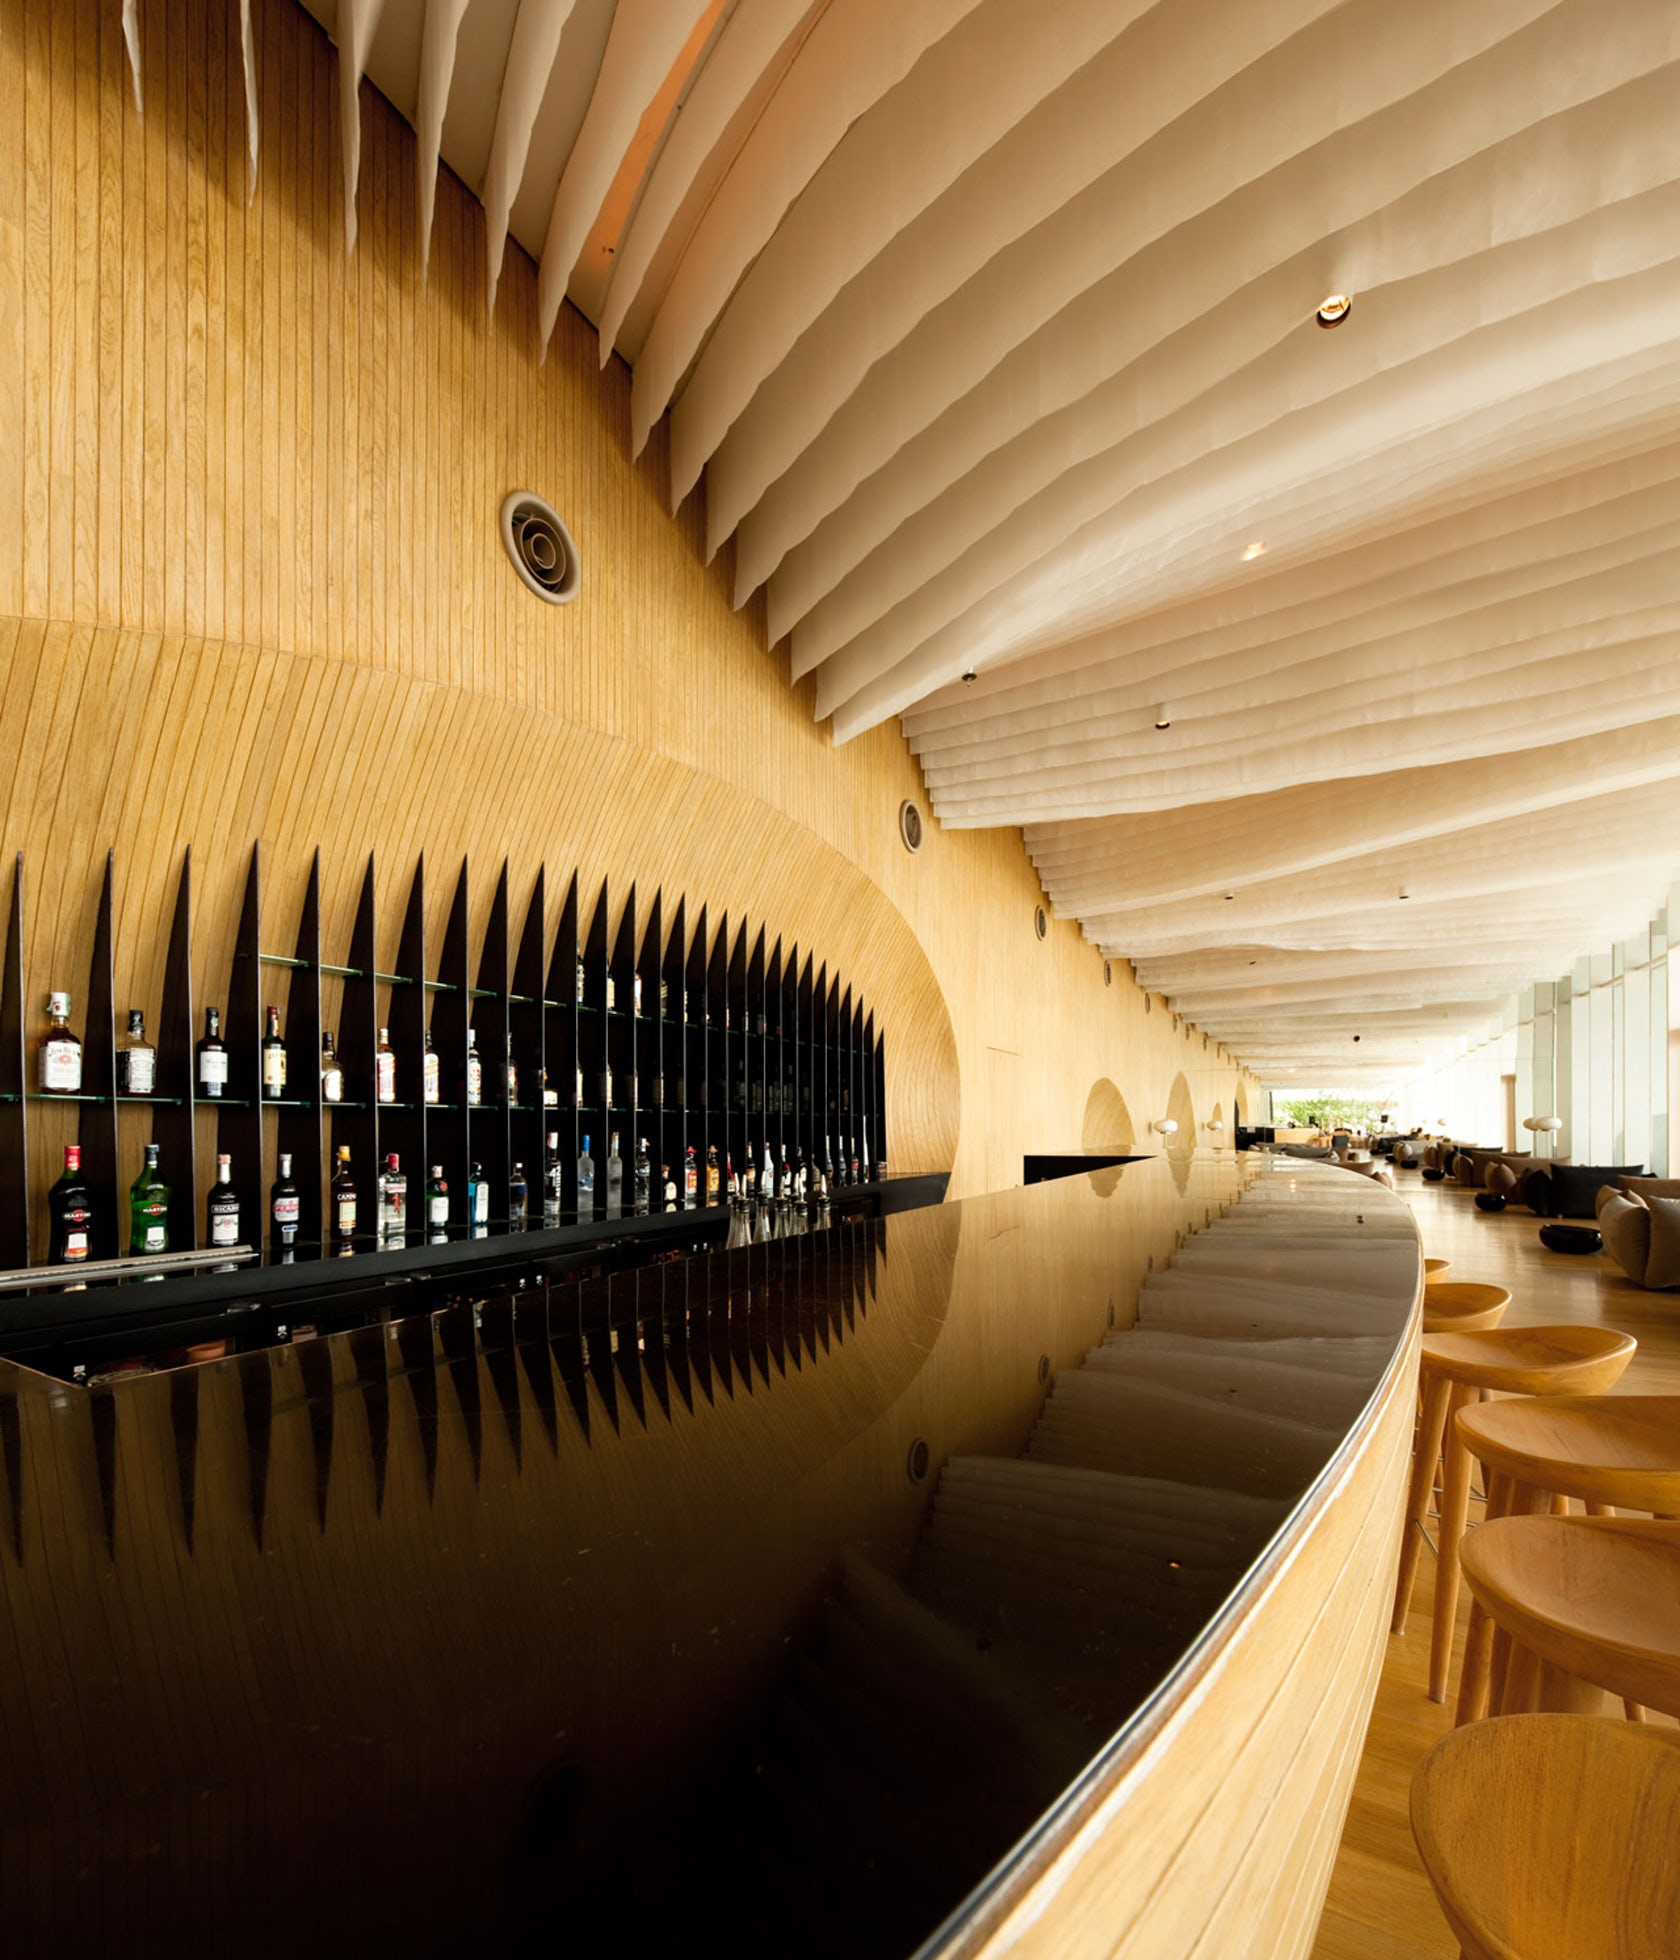 Hilton Pattaya – Lobby, Bar, and Linkage Spaces - Architizer